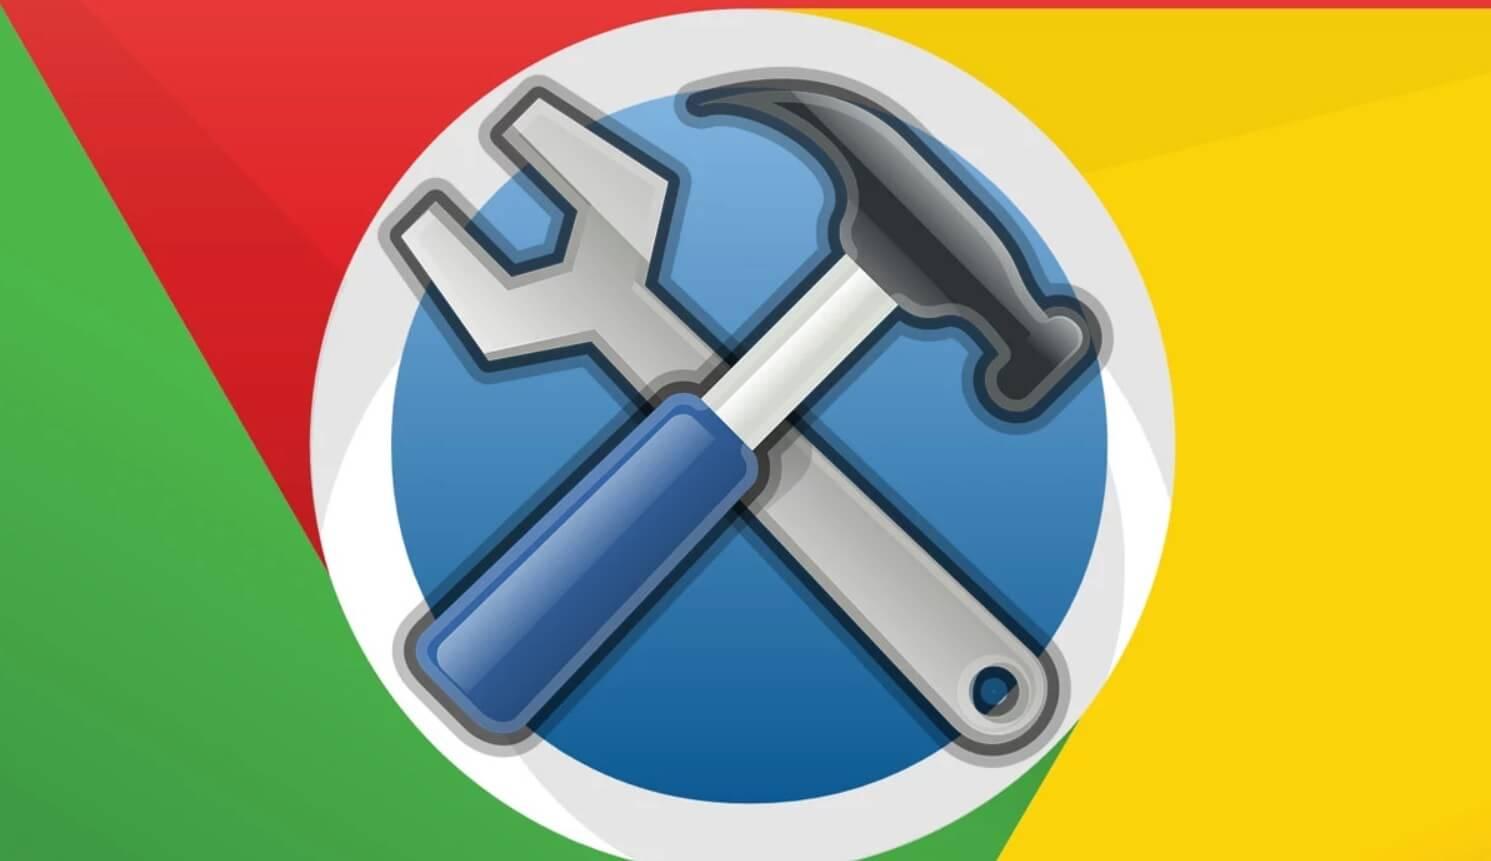 chrome-cleanup-tool-indir